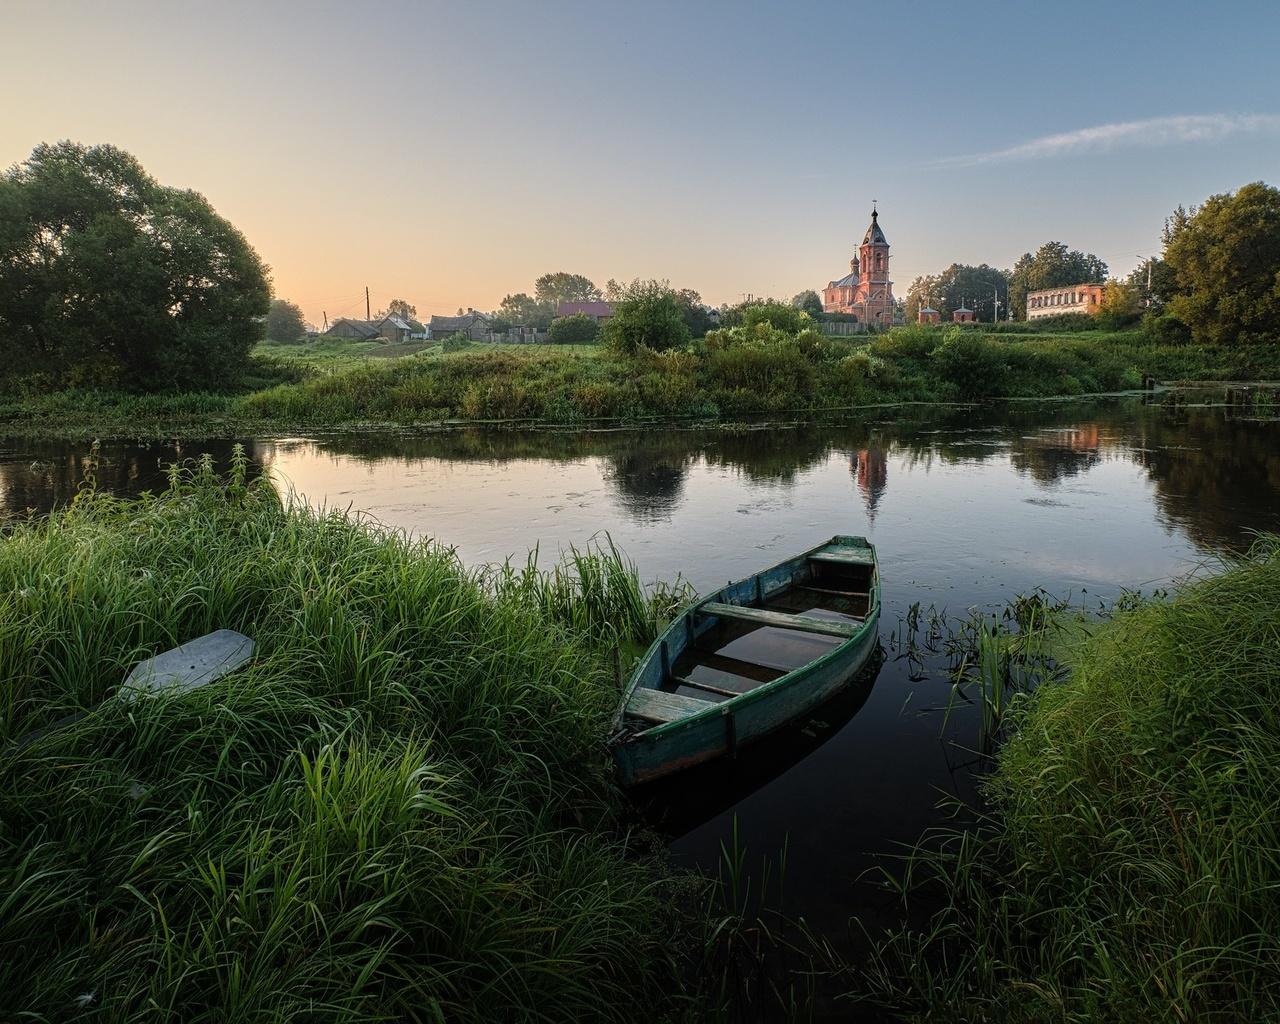 лето, трава, деревья, пейзаж, природа, лодка, деревня, берега, речушка, григорий бельцев